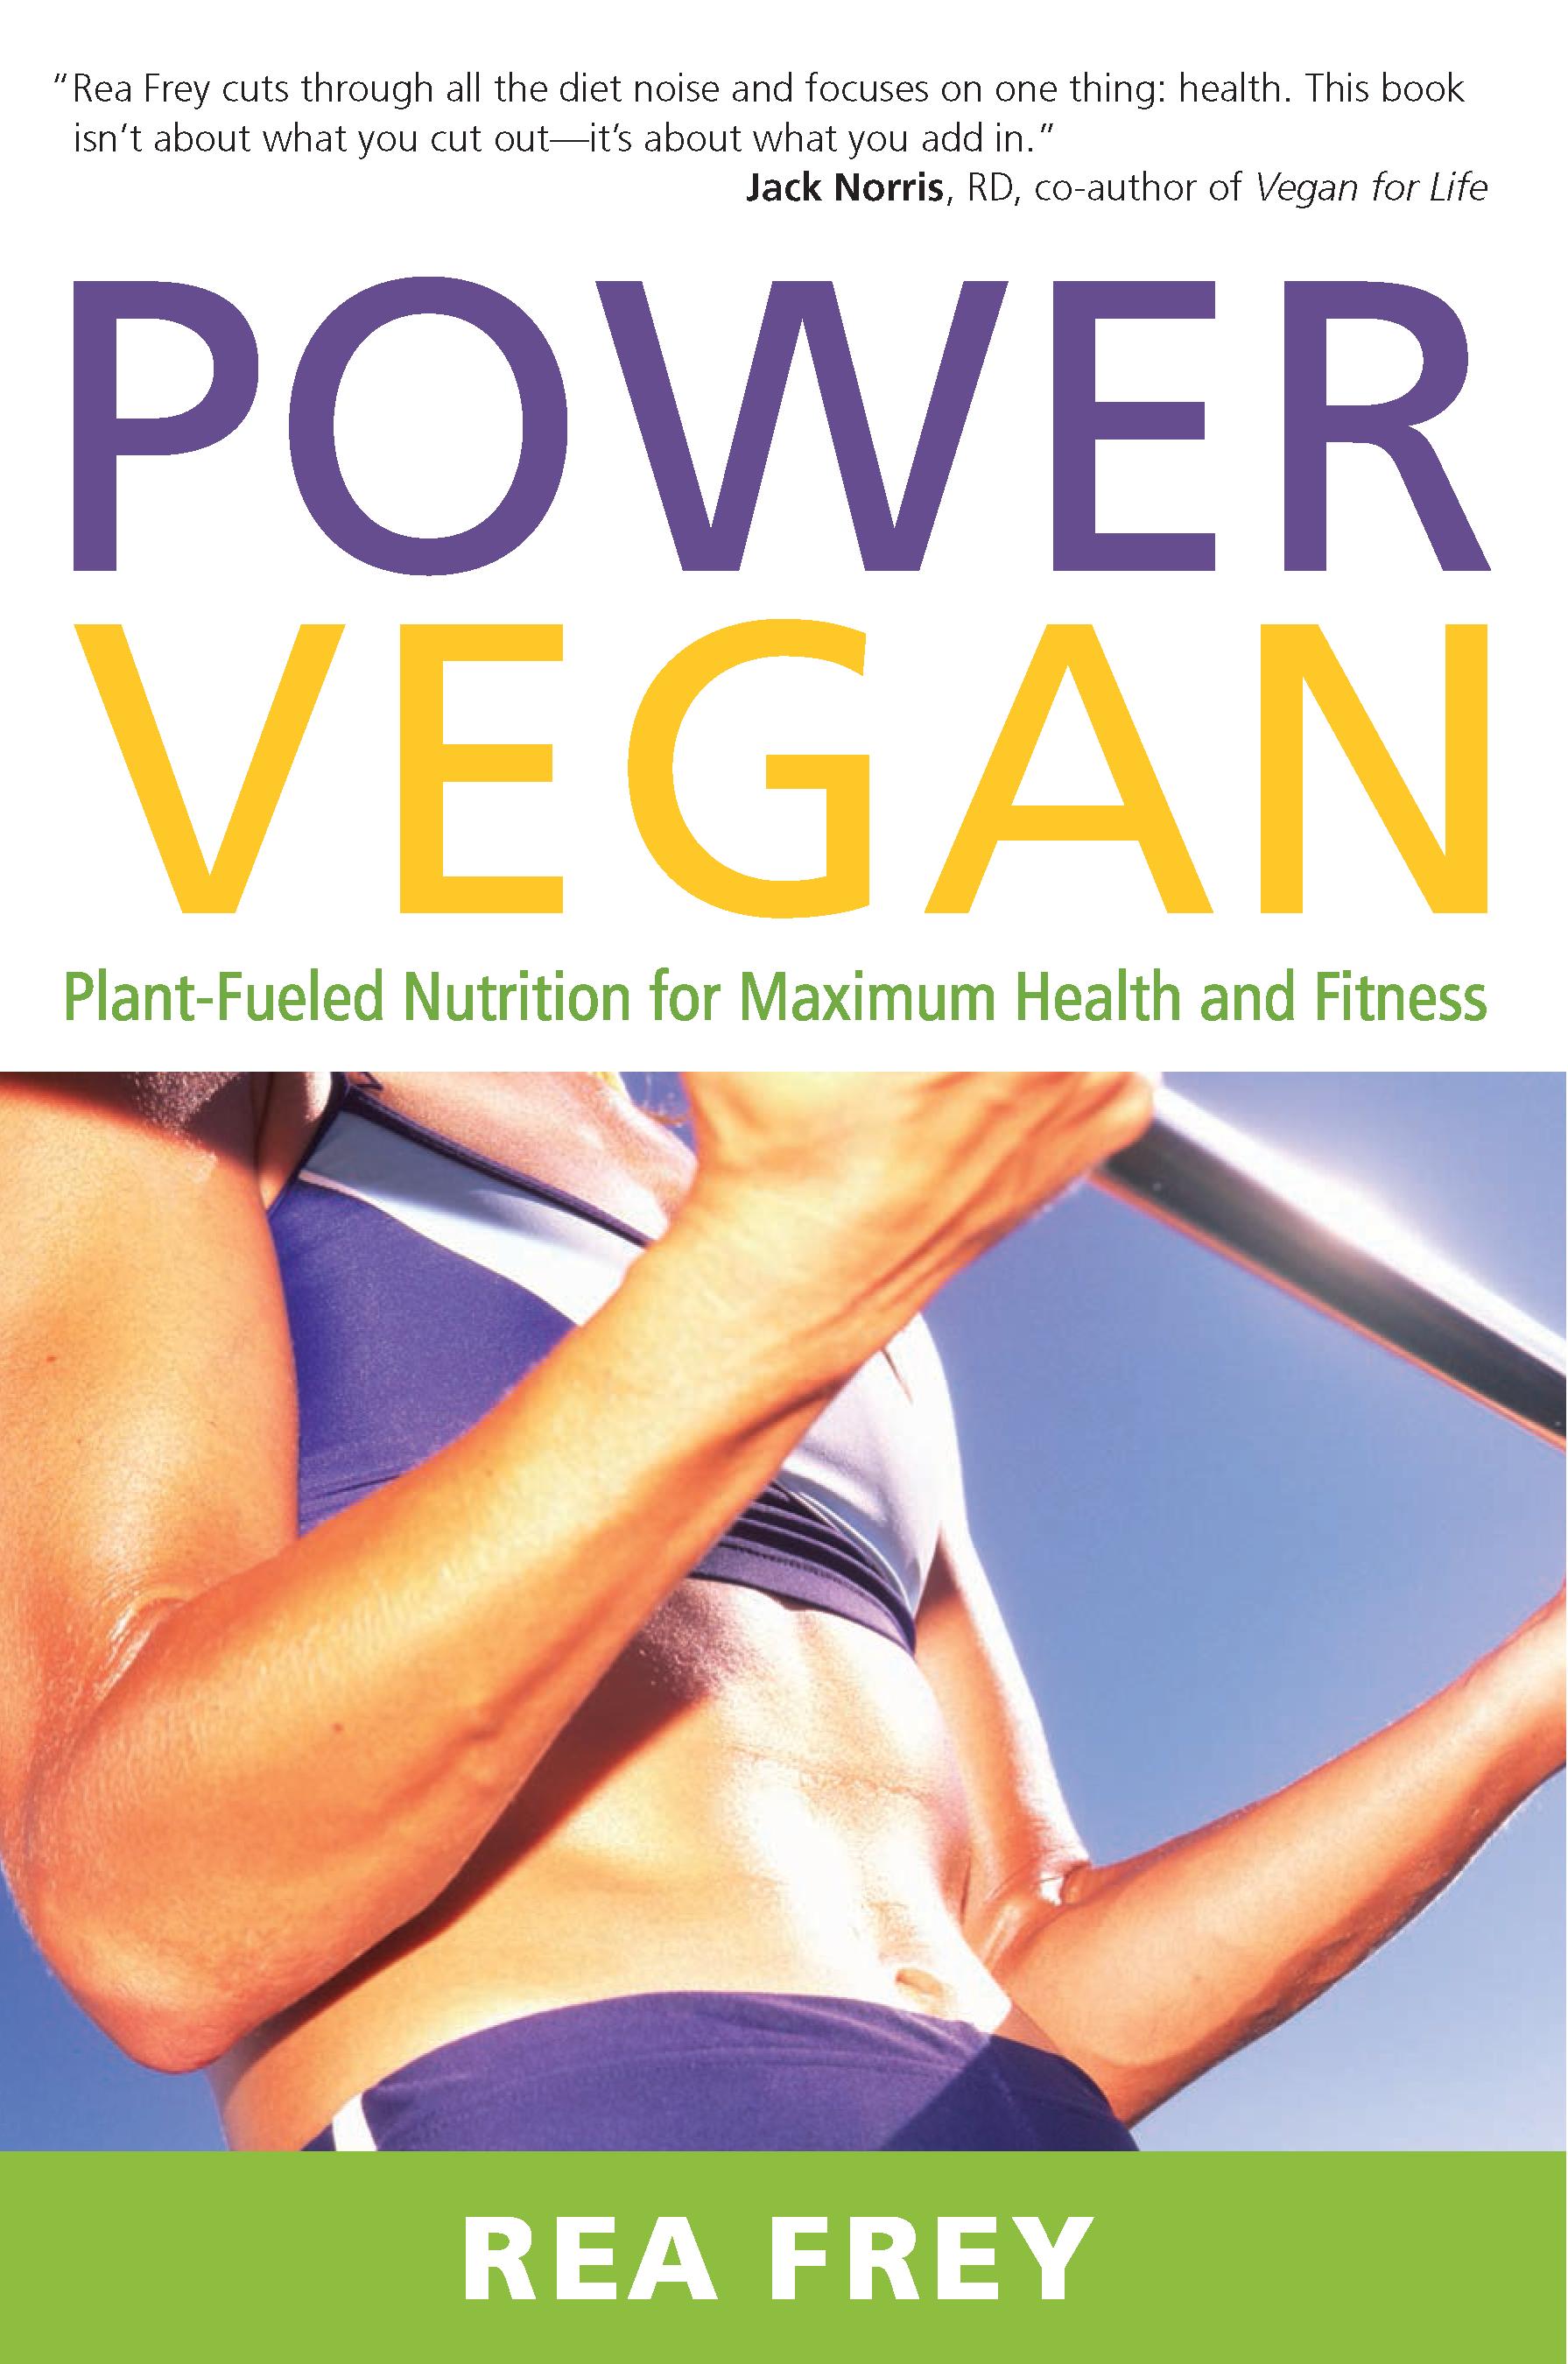 Power Vegan_Page_01.png